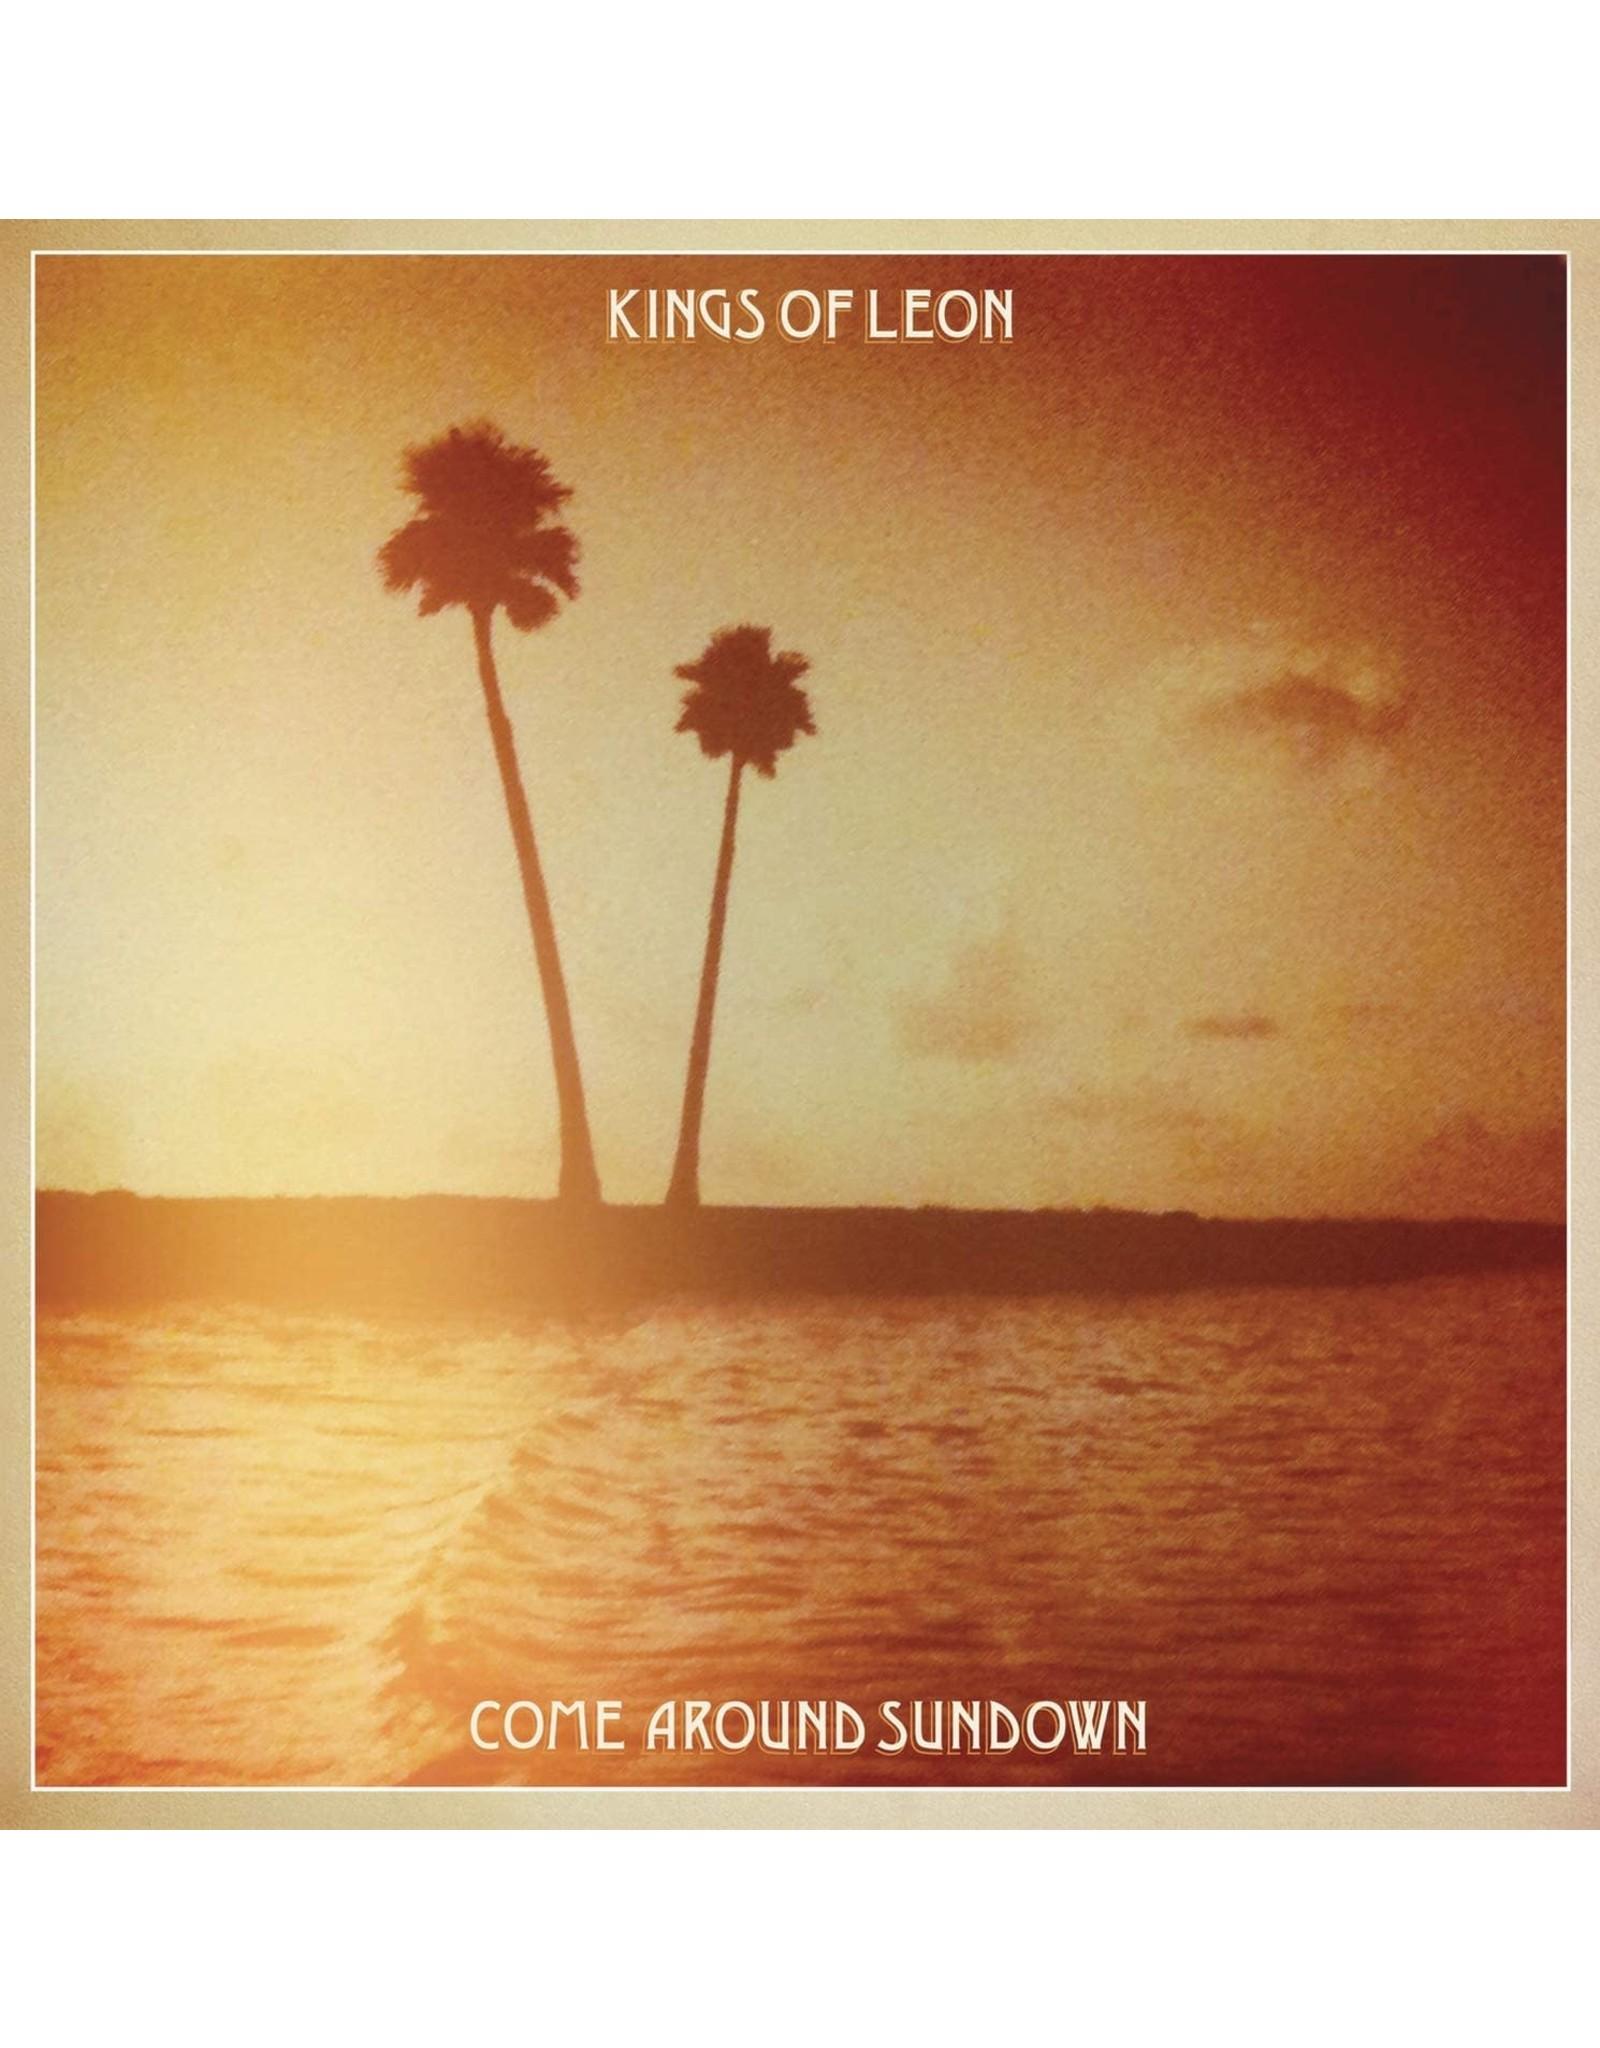 Kings of Leon - Come Around Sundown 2LP